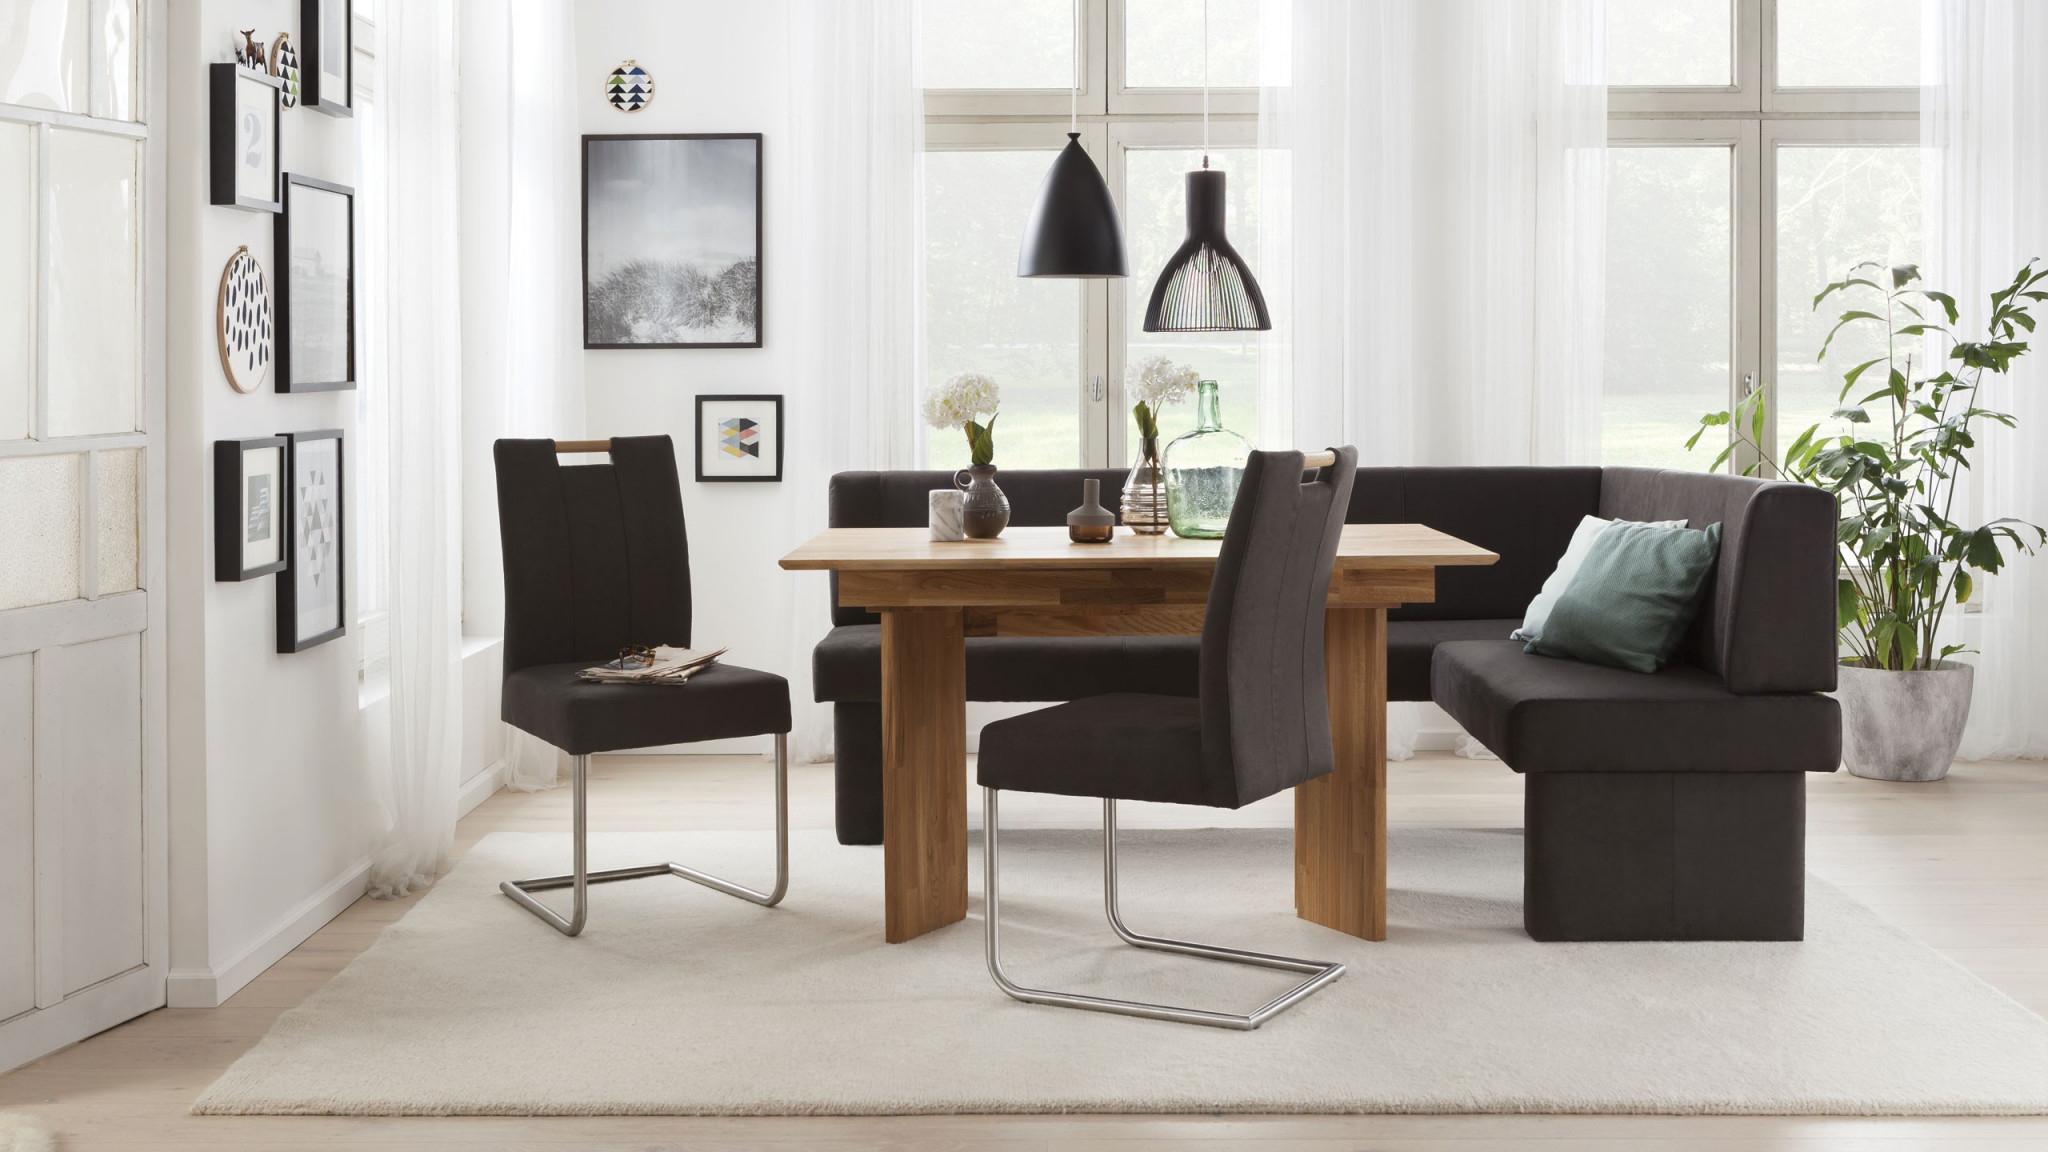 Joop Möbel Wohnzimmer Beautiful 35 Minimaliste Segmuller